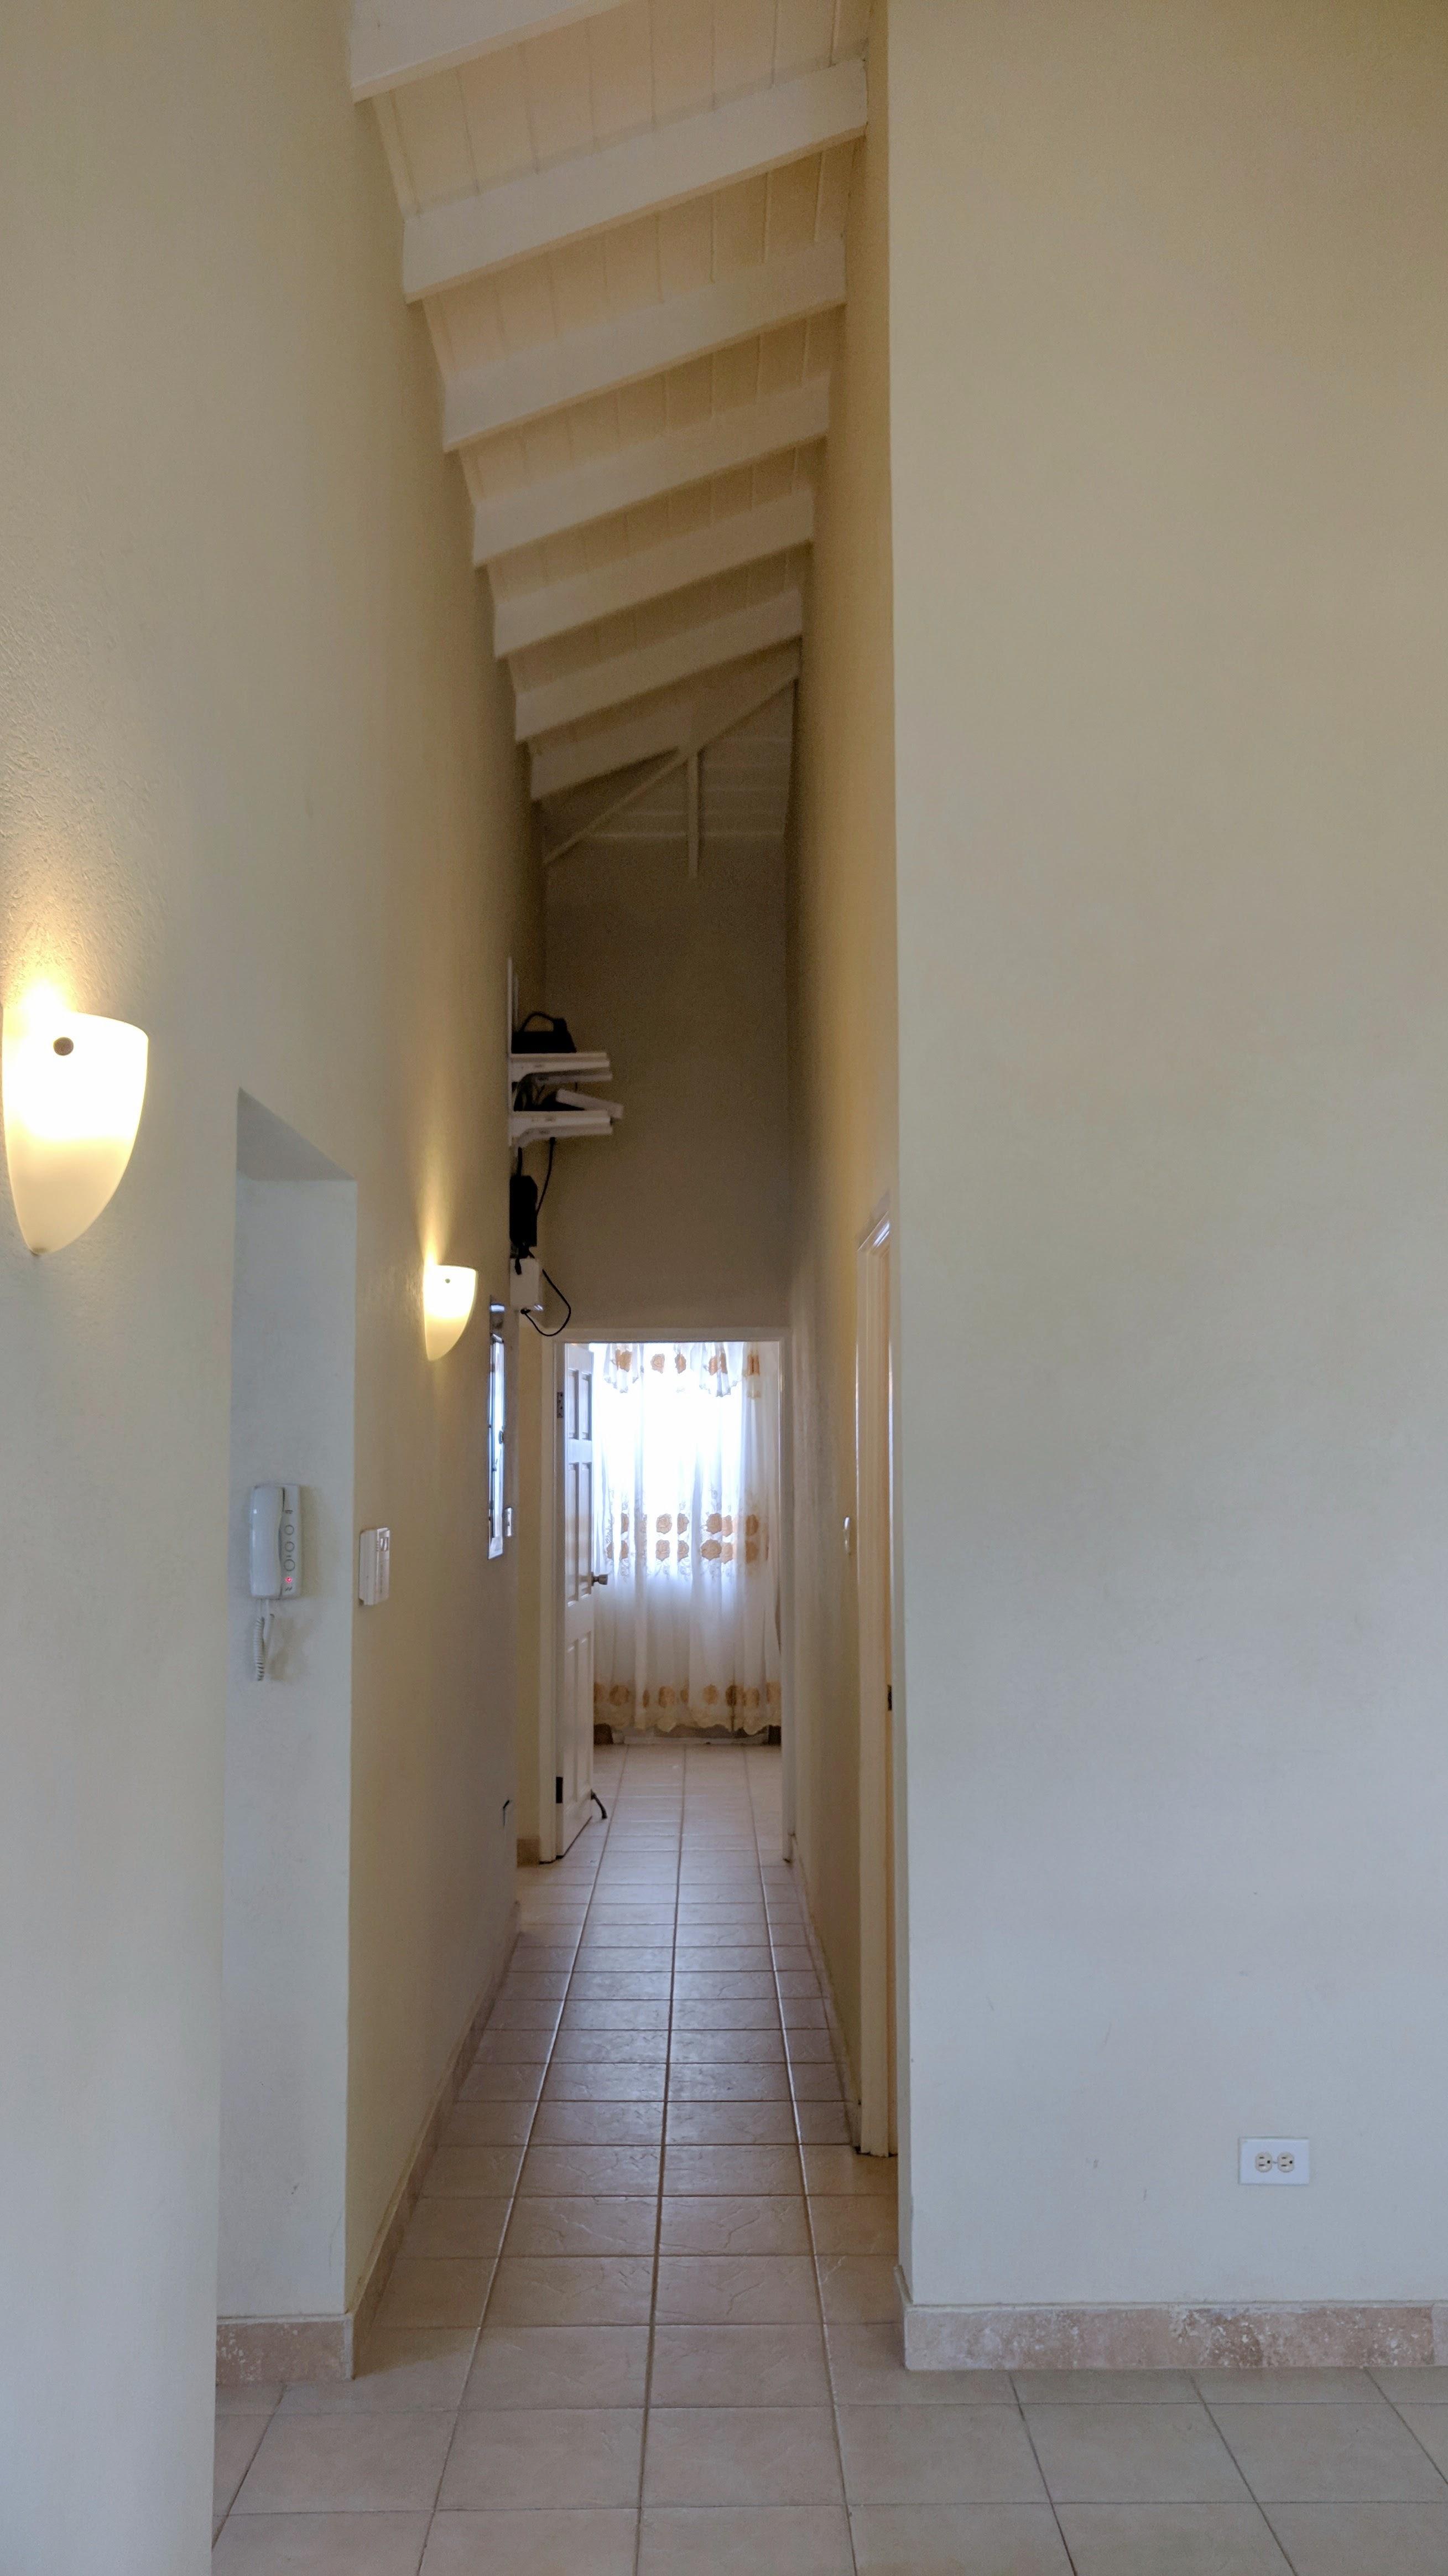 Hallway, Belair, St. George